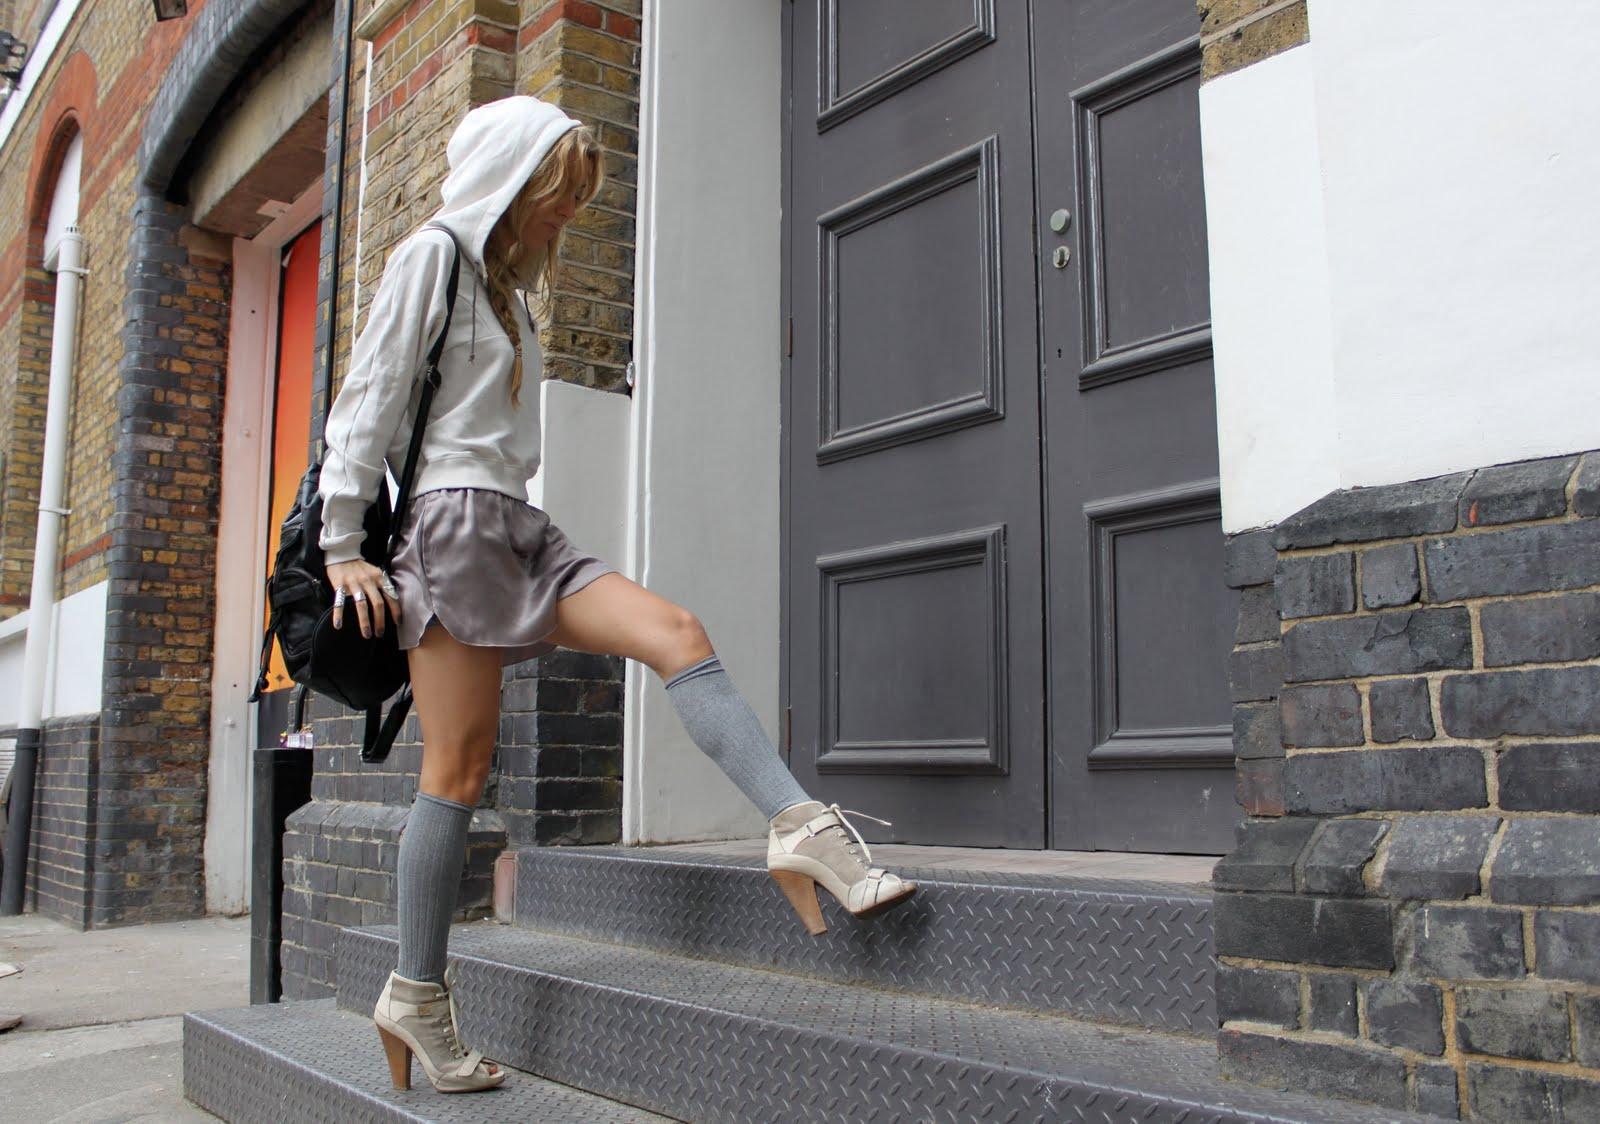 http://3.bp.blogspot.com/_g1lH2C-HTxE/S-16_IkfXaI/AAAAAAAAA4U/SiqC6OBfiwY/s1600/5-inch-and-up-blog-topshop-silk-shorts-barbara-bui-boots-2.JPG